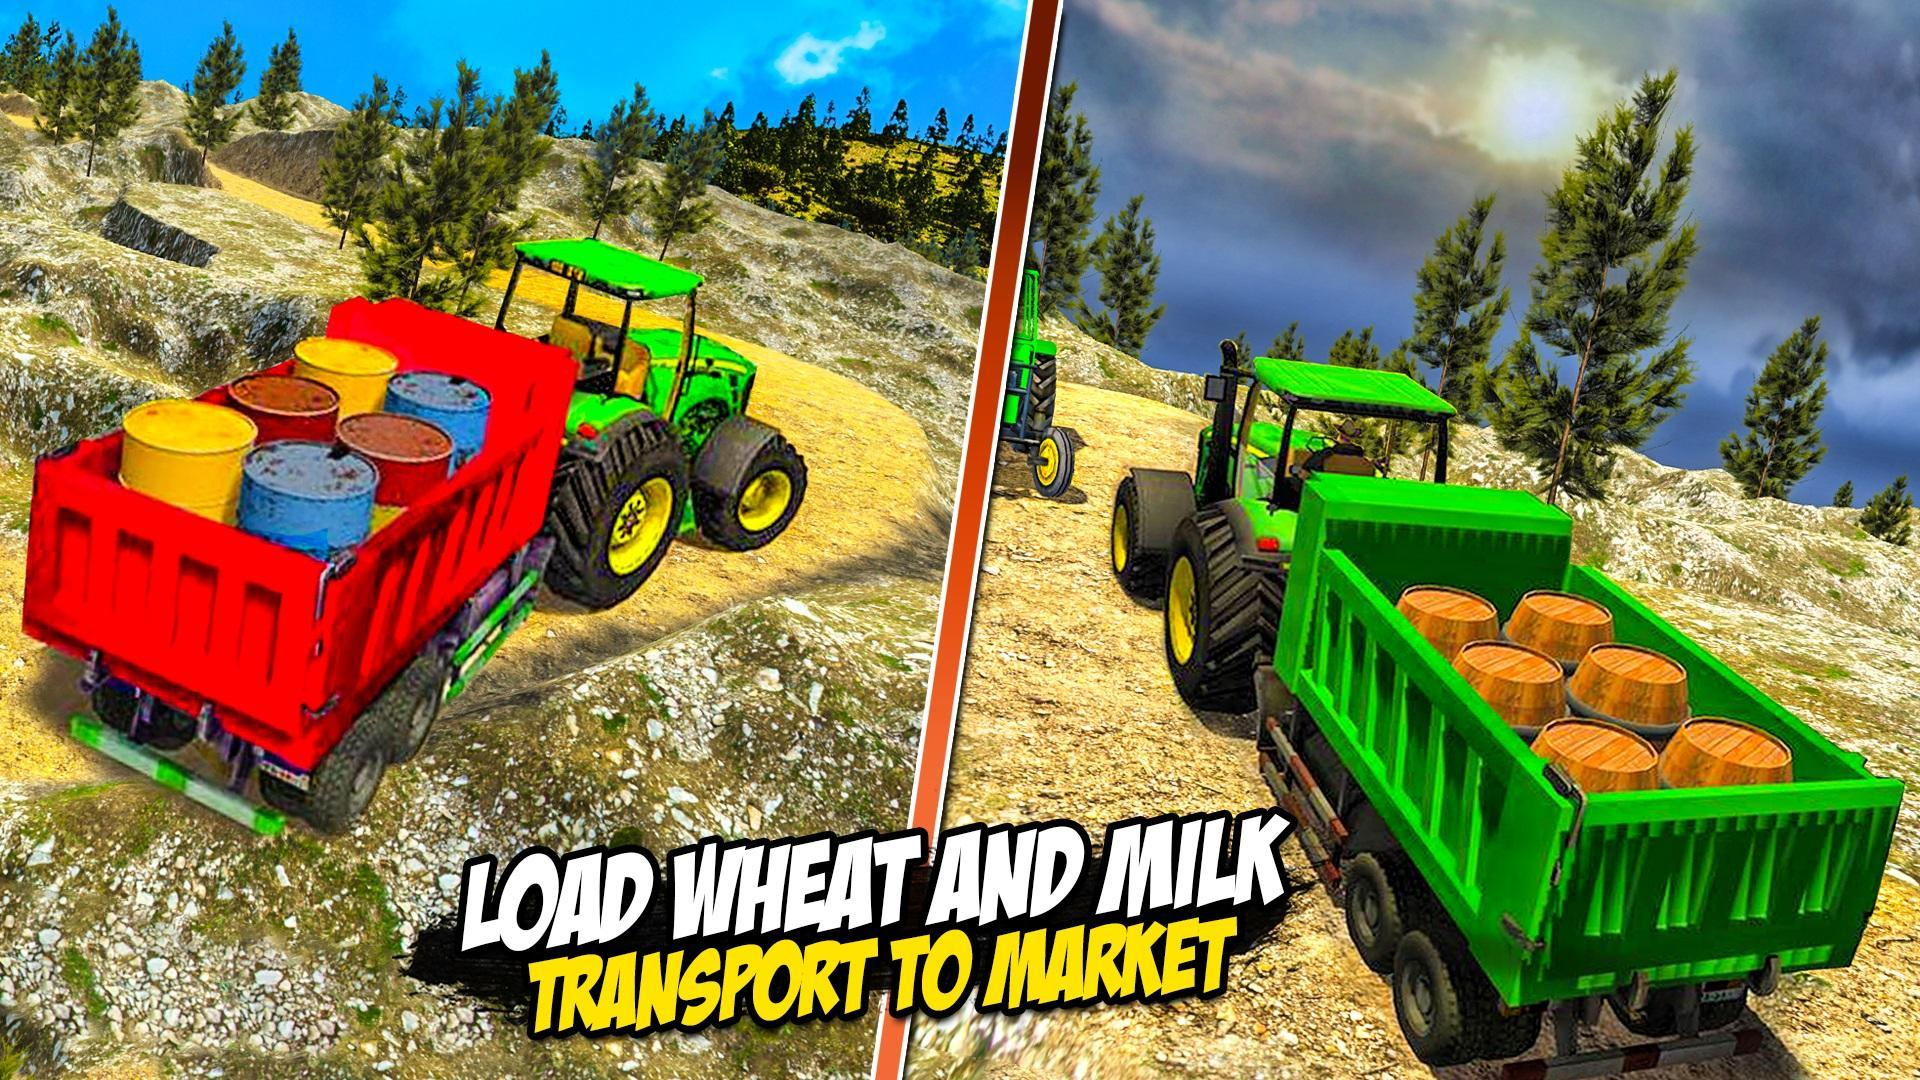 Heavy Tractor Trolley: Tractor Cargo Simulator🚜🚜 3.1 Screenshot 2